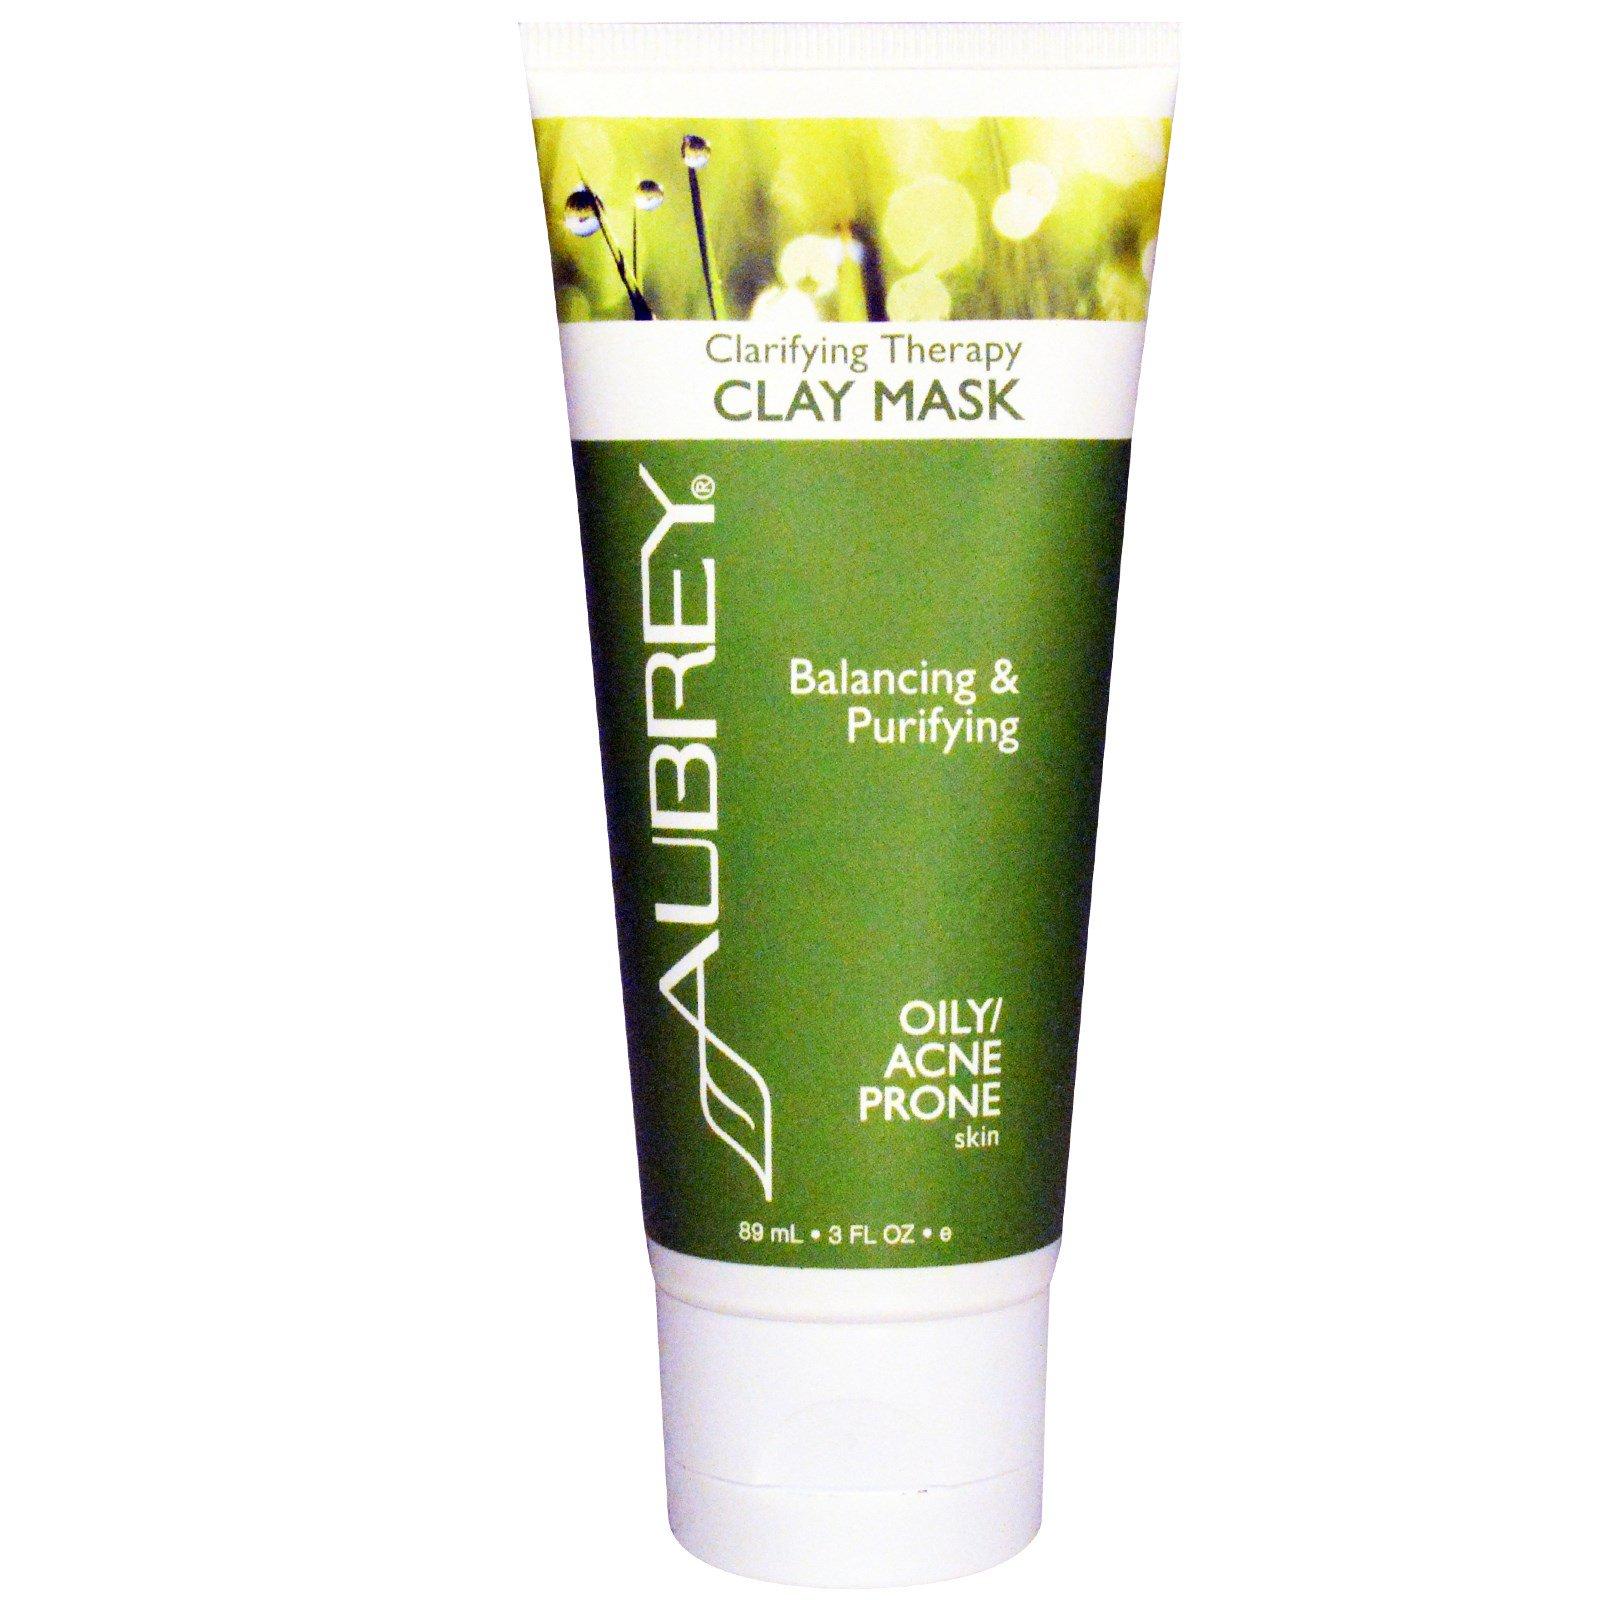 Aubrey Organics, Clarifying Therapy Clay Mask, Oily / Acne Prone Skin, 3 fl oz (89 ml)